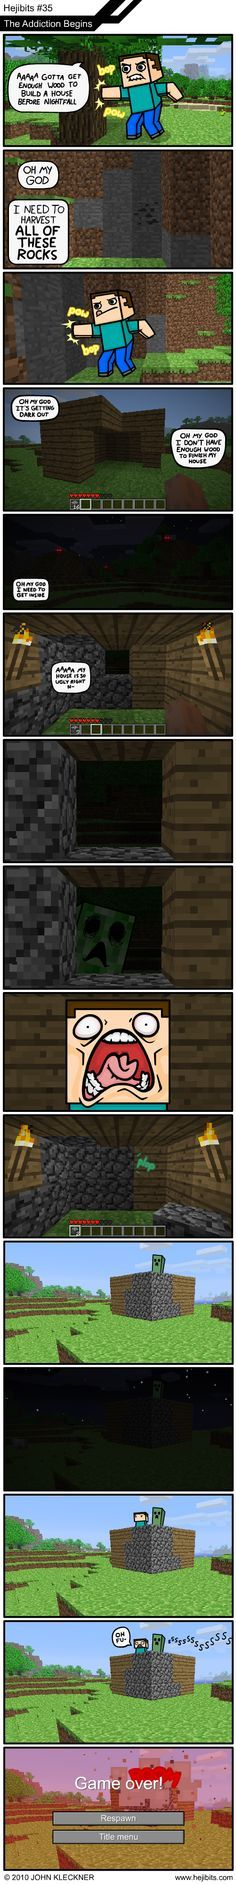 The minecraft addiction begins